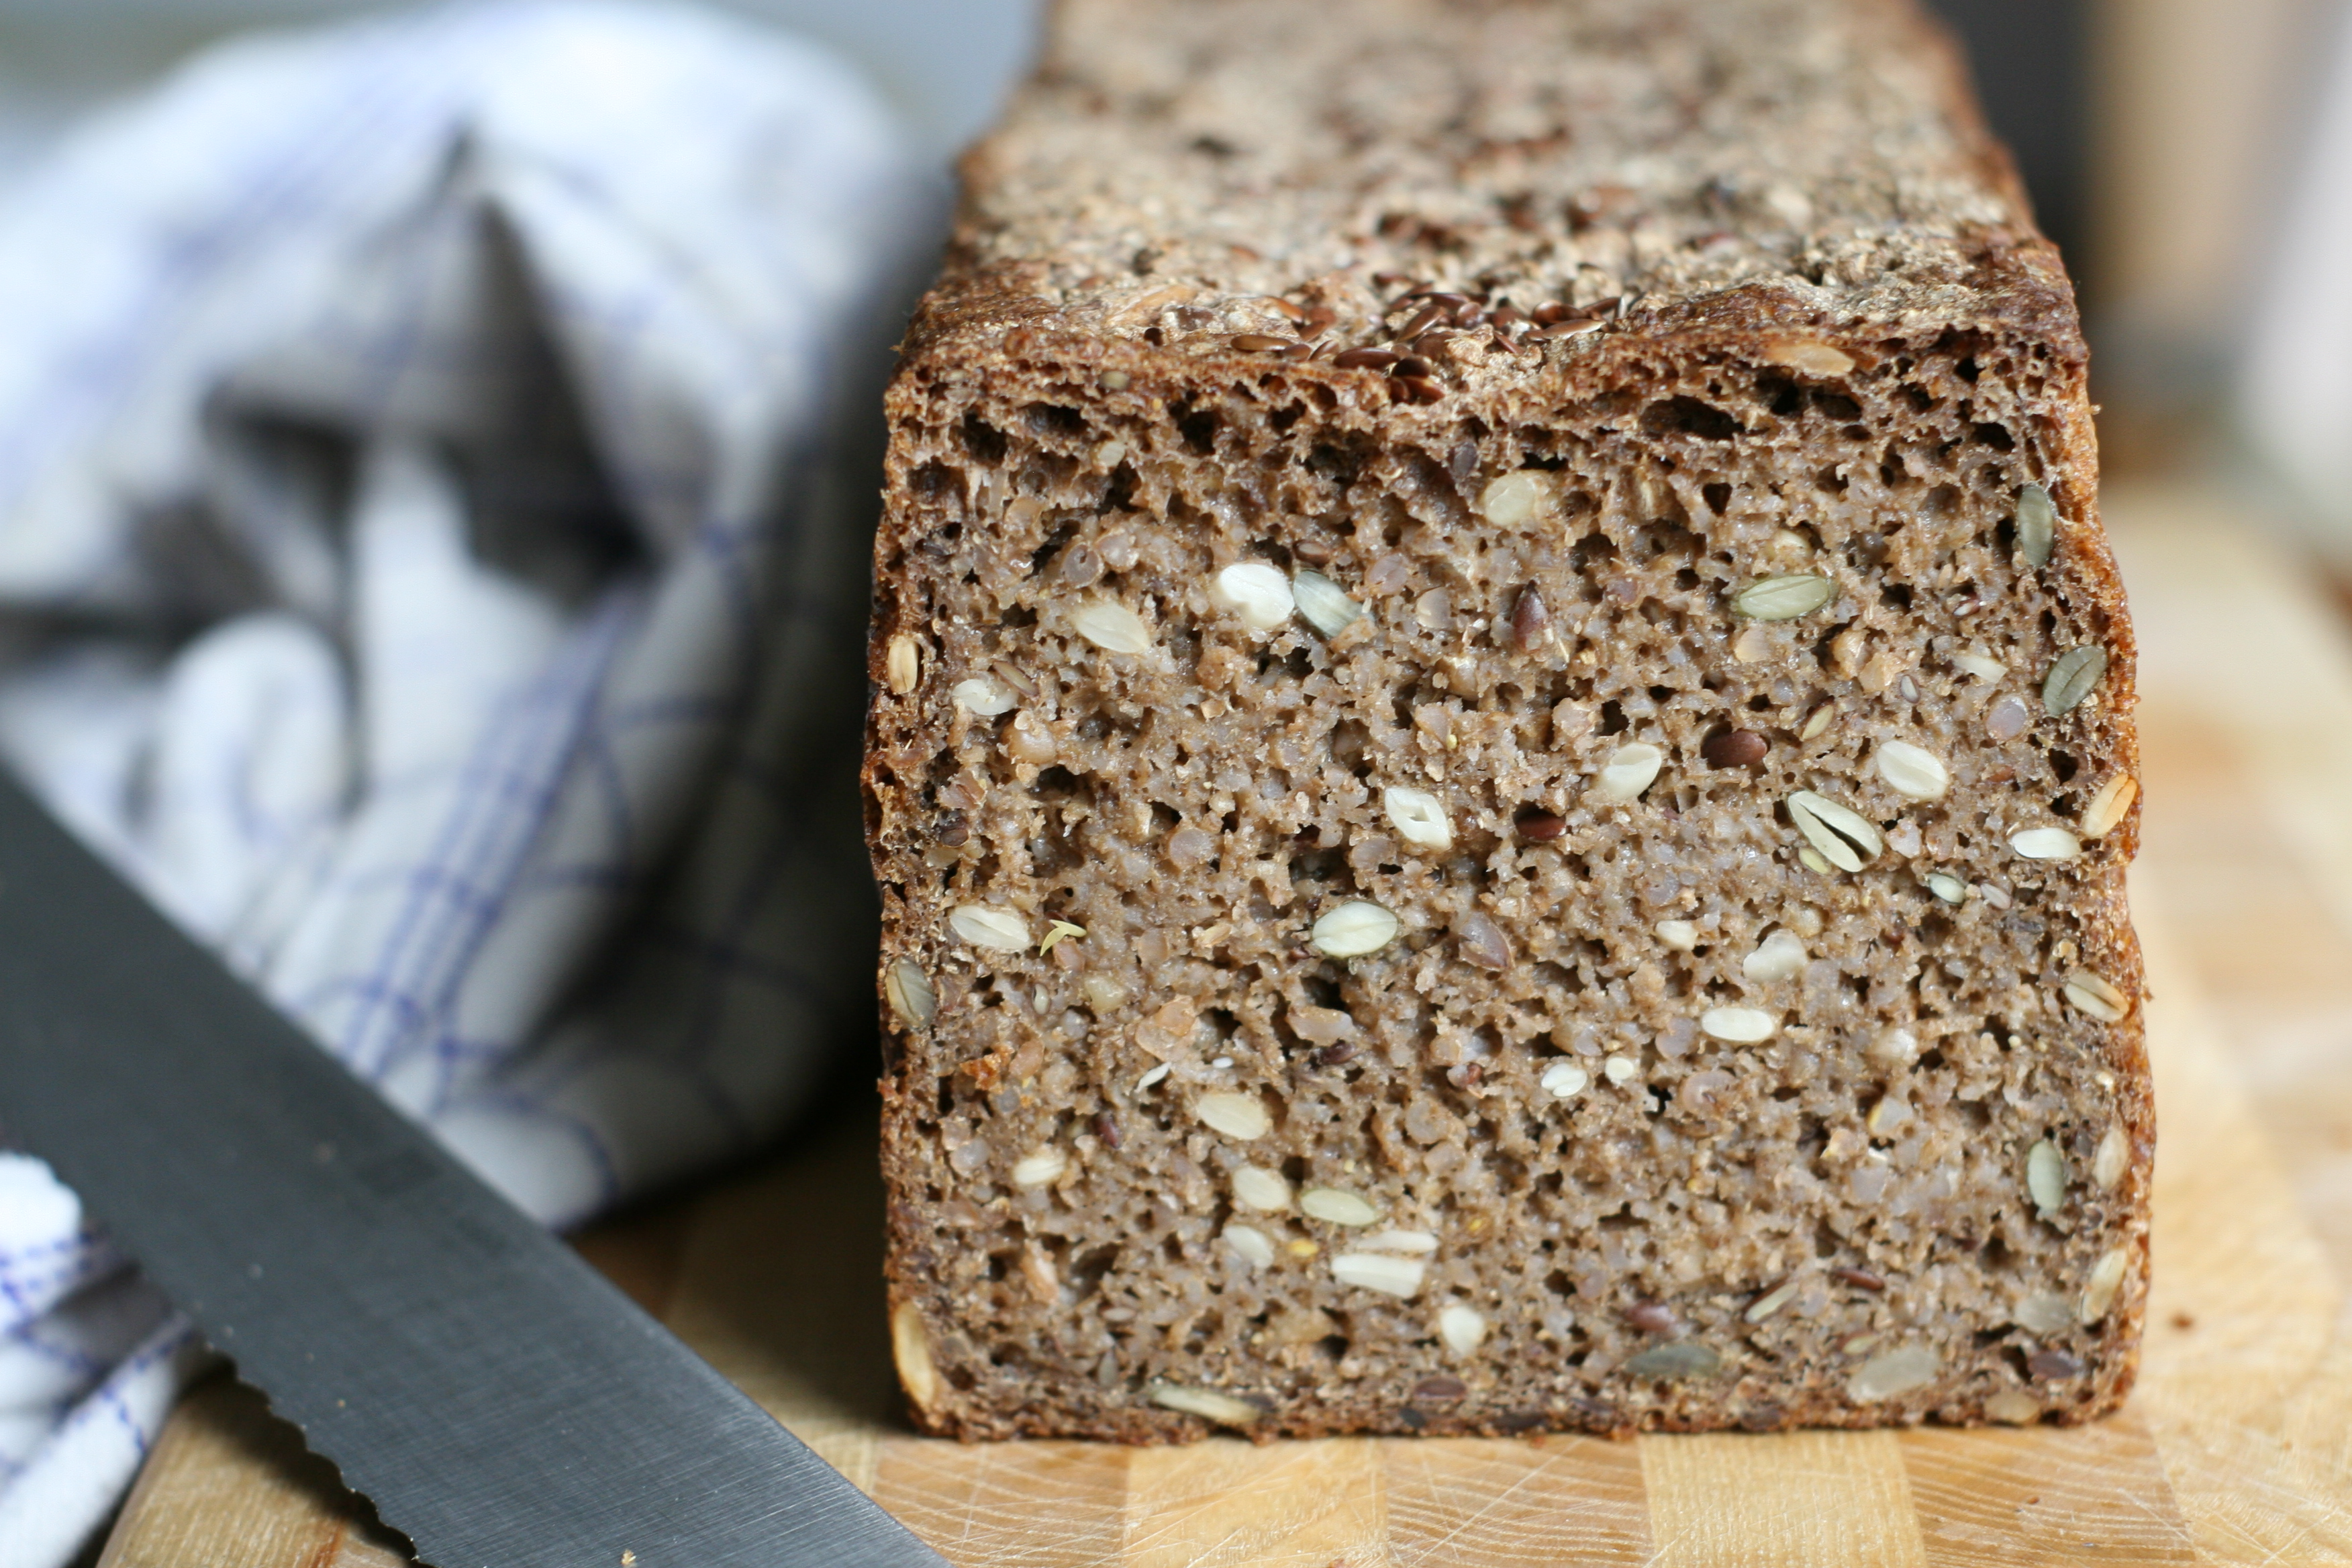 Classic Danish rye bread with Agrain® 03 Maskmel Stout